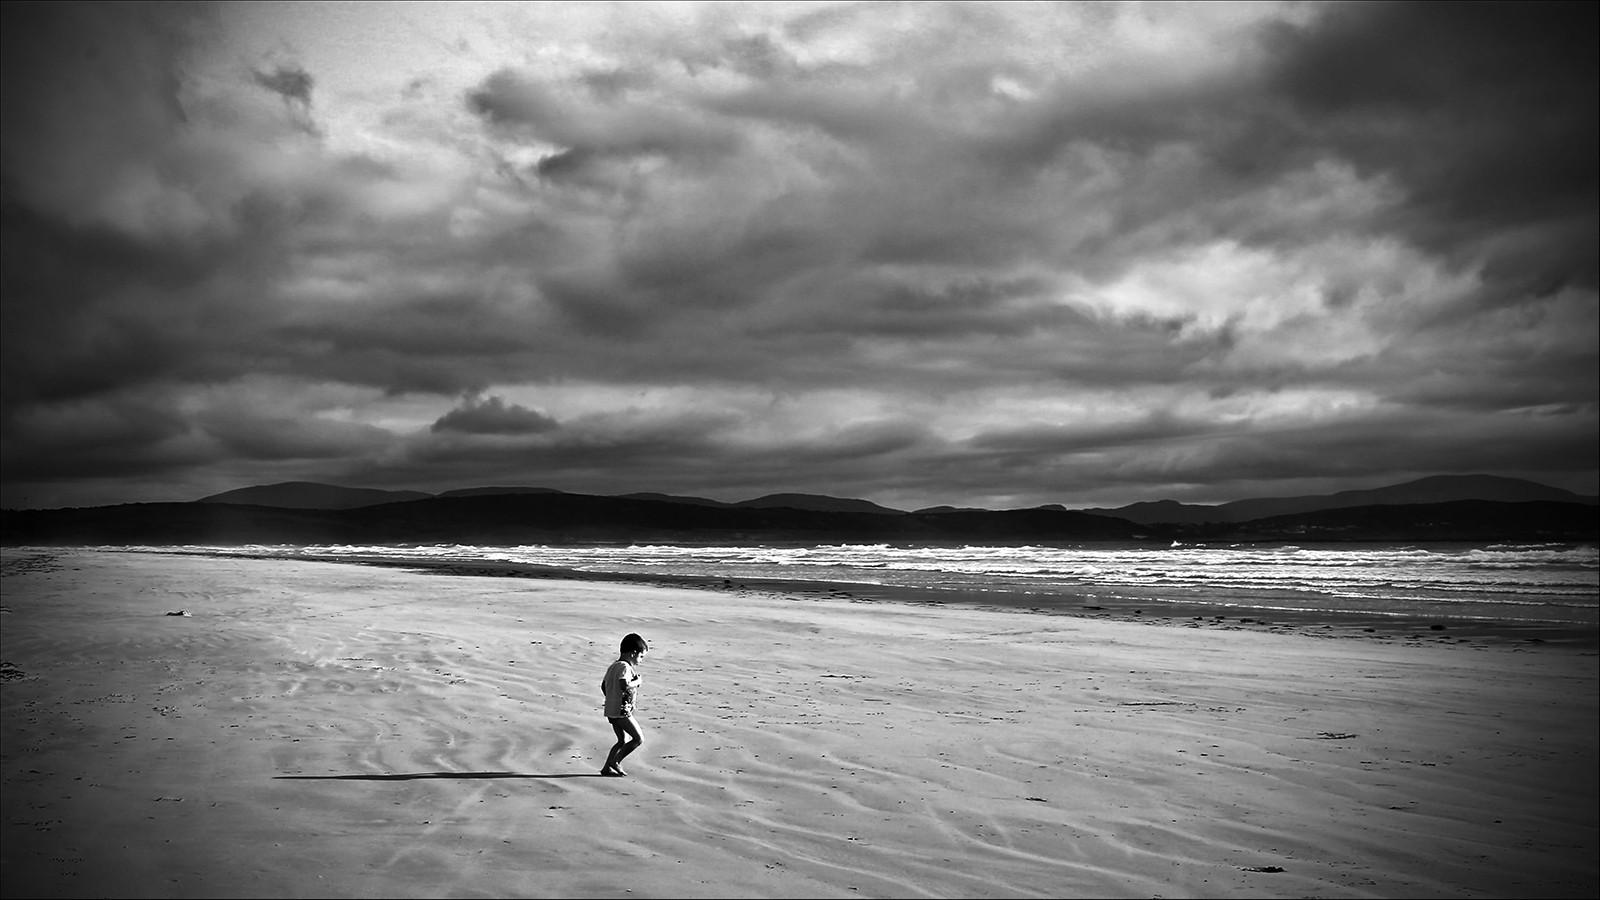 MONO - Beach Commer by Desi McPhillips (10 marks)